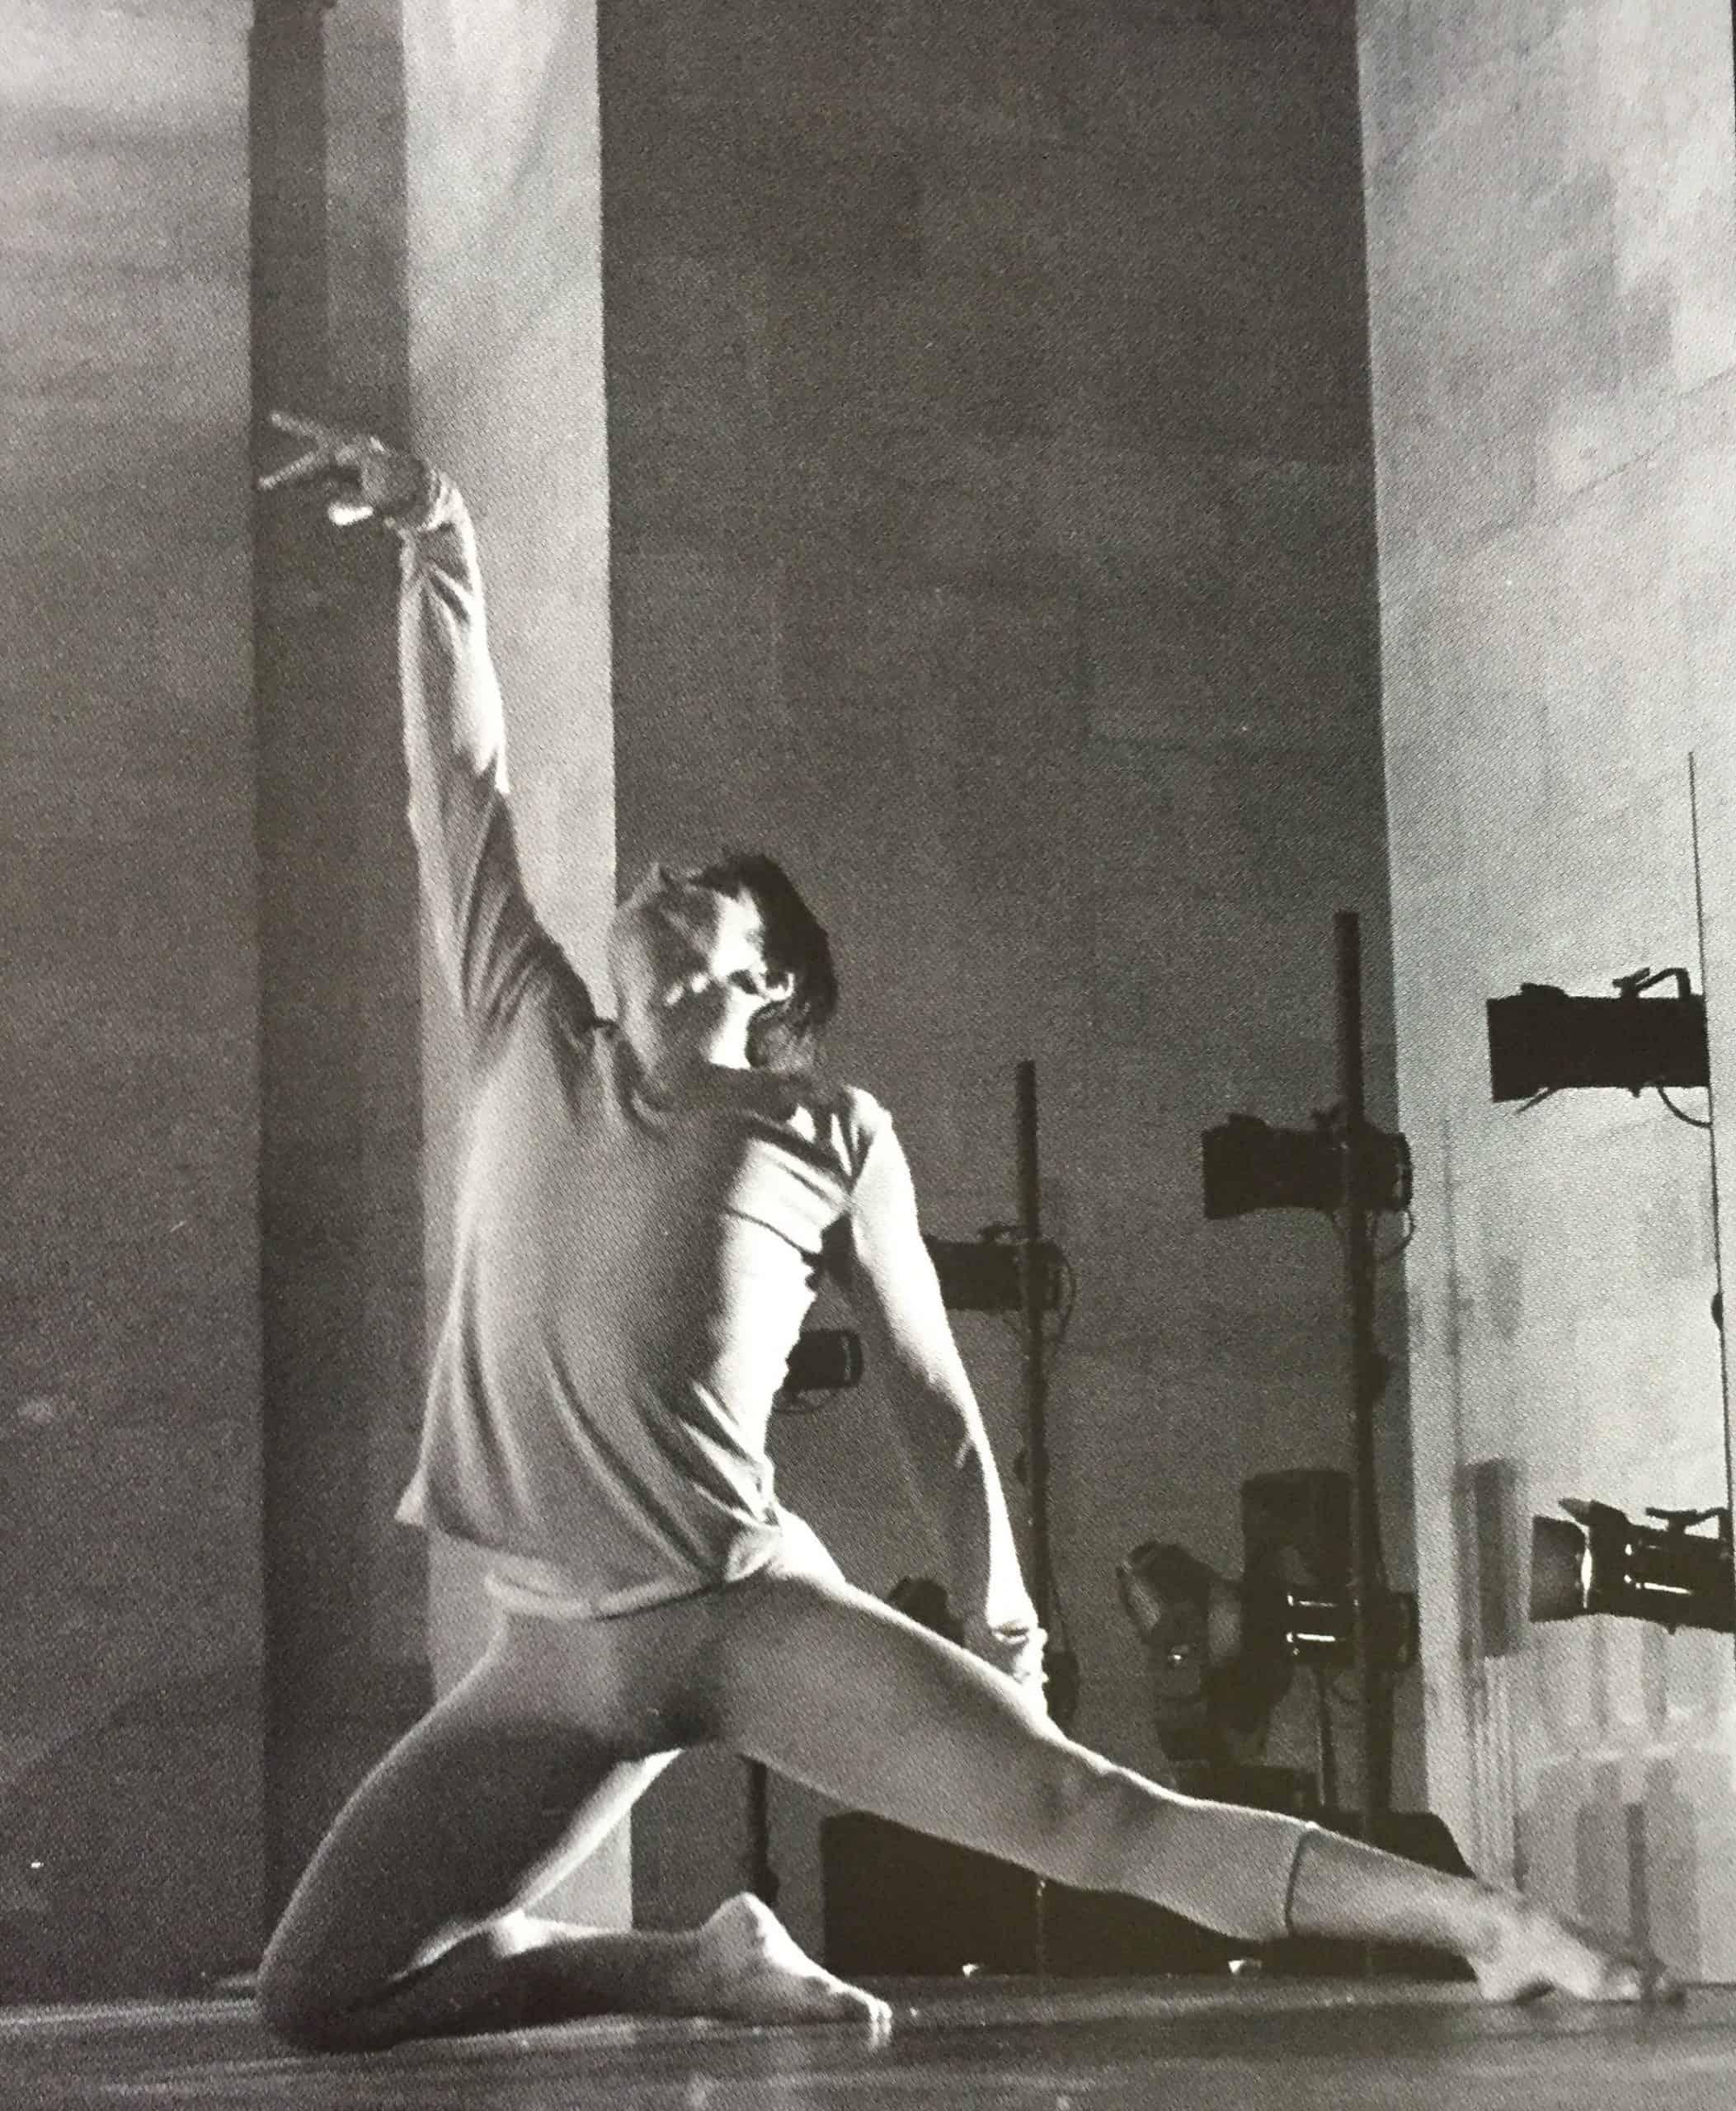 Juan Rodriguez ballet teacher at Danceworks London